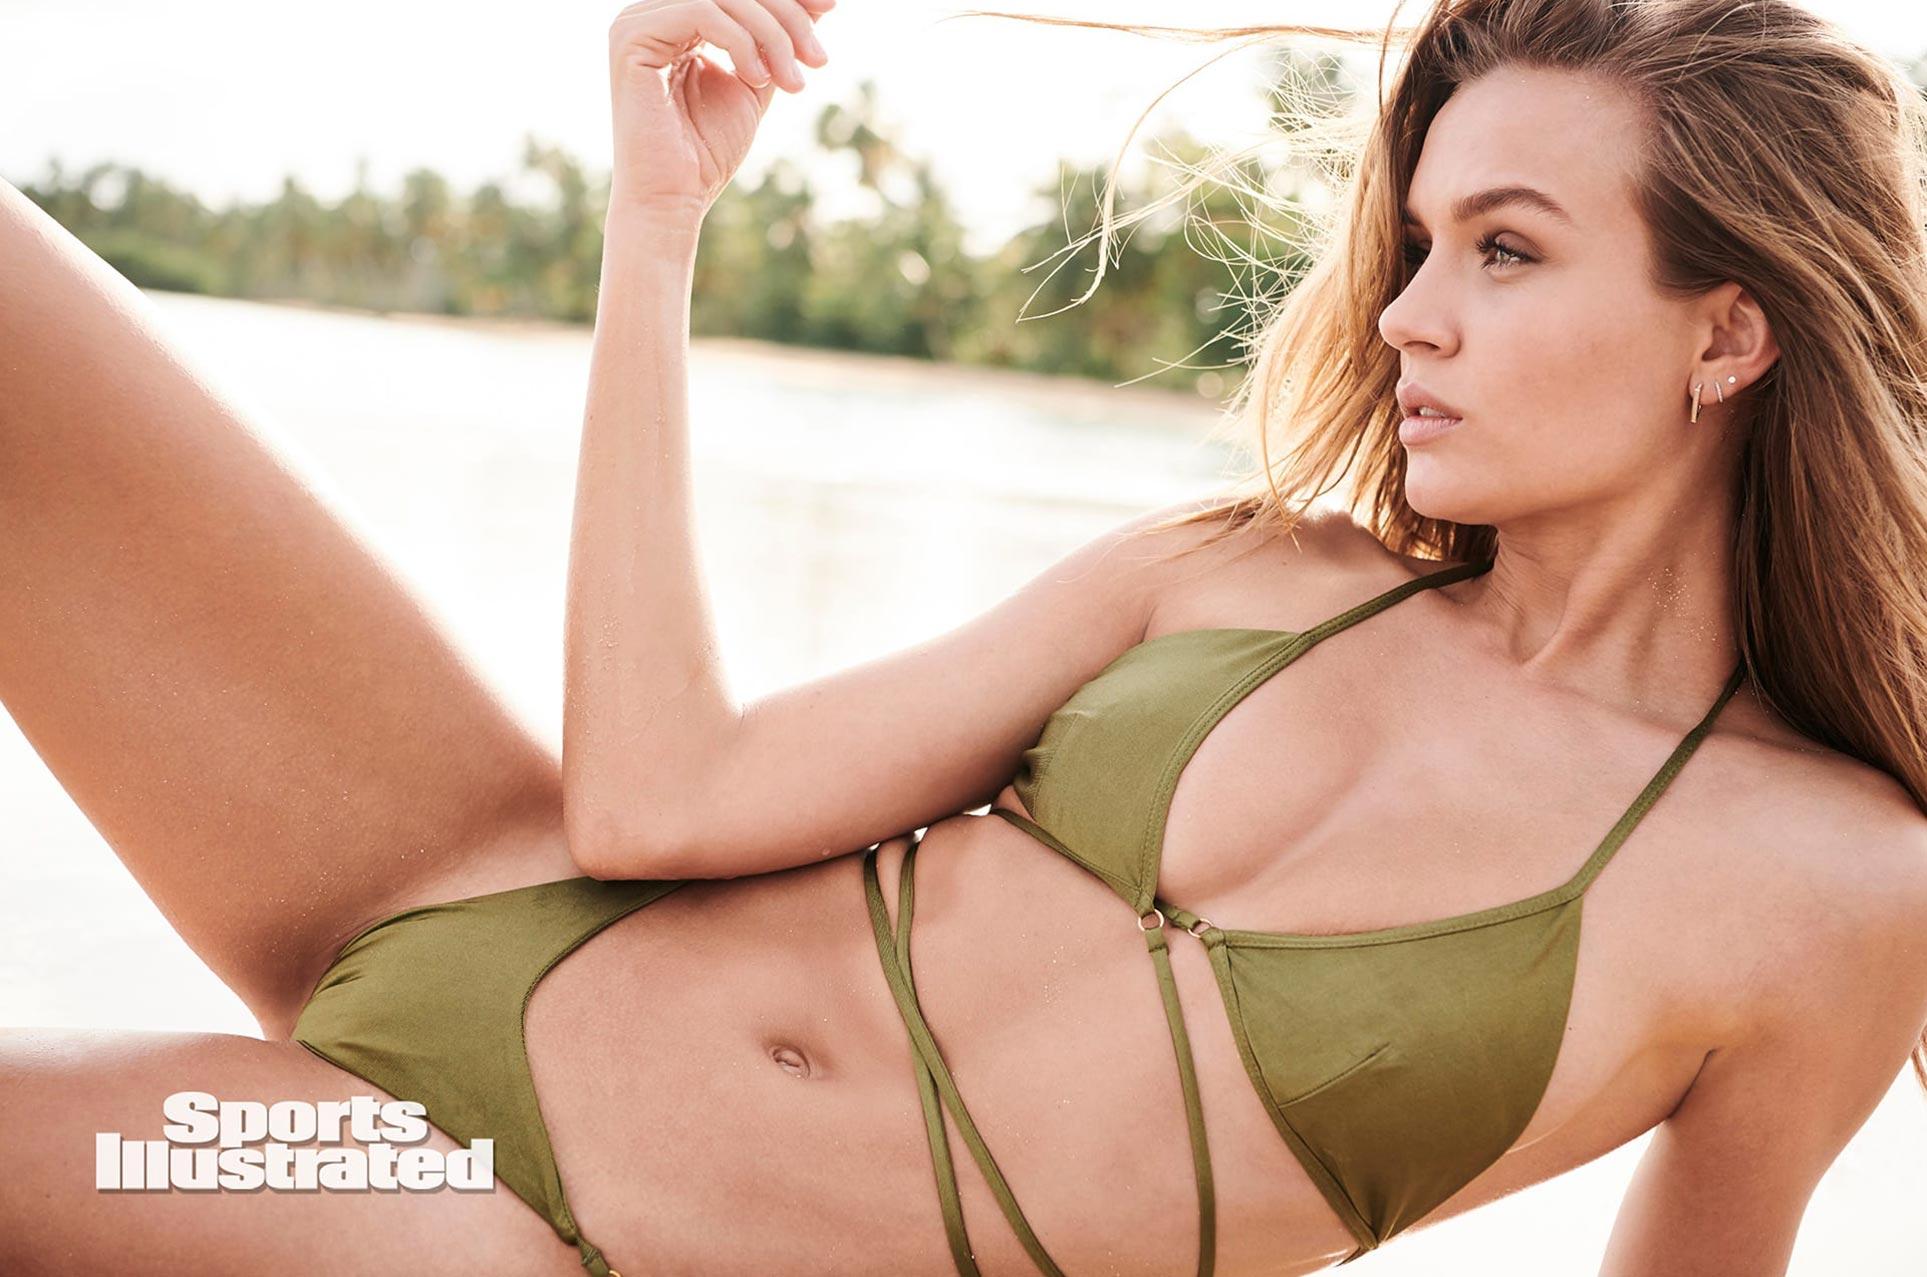 Жозефин Скривер в каталоге купальников Sports Illustrated Swimsuit 2020 / фото 04